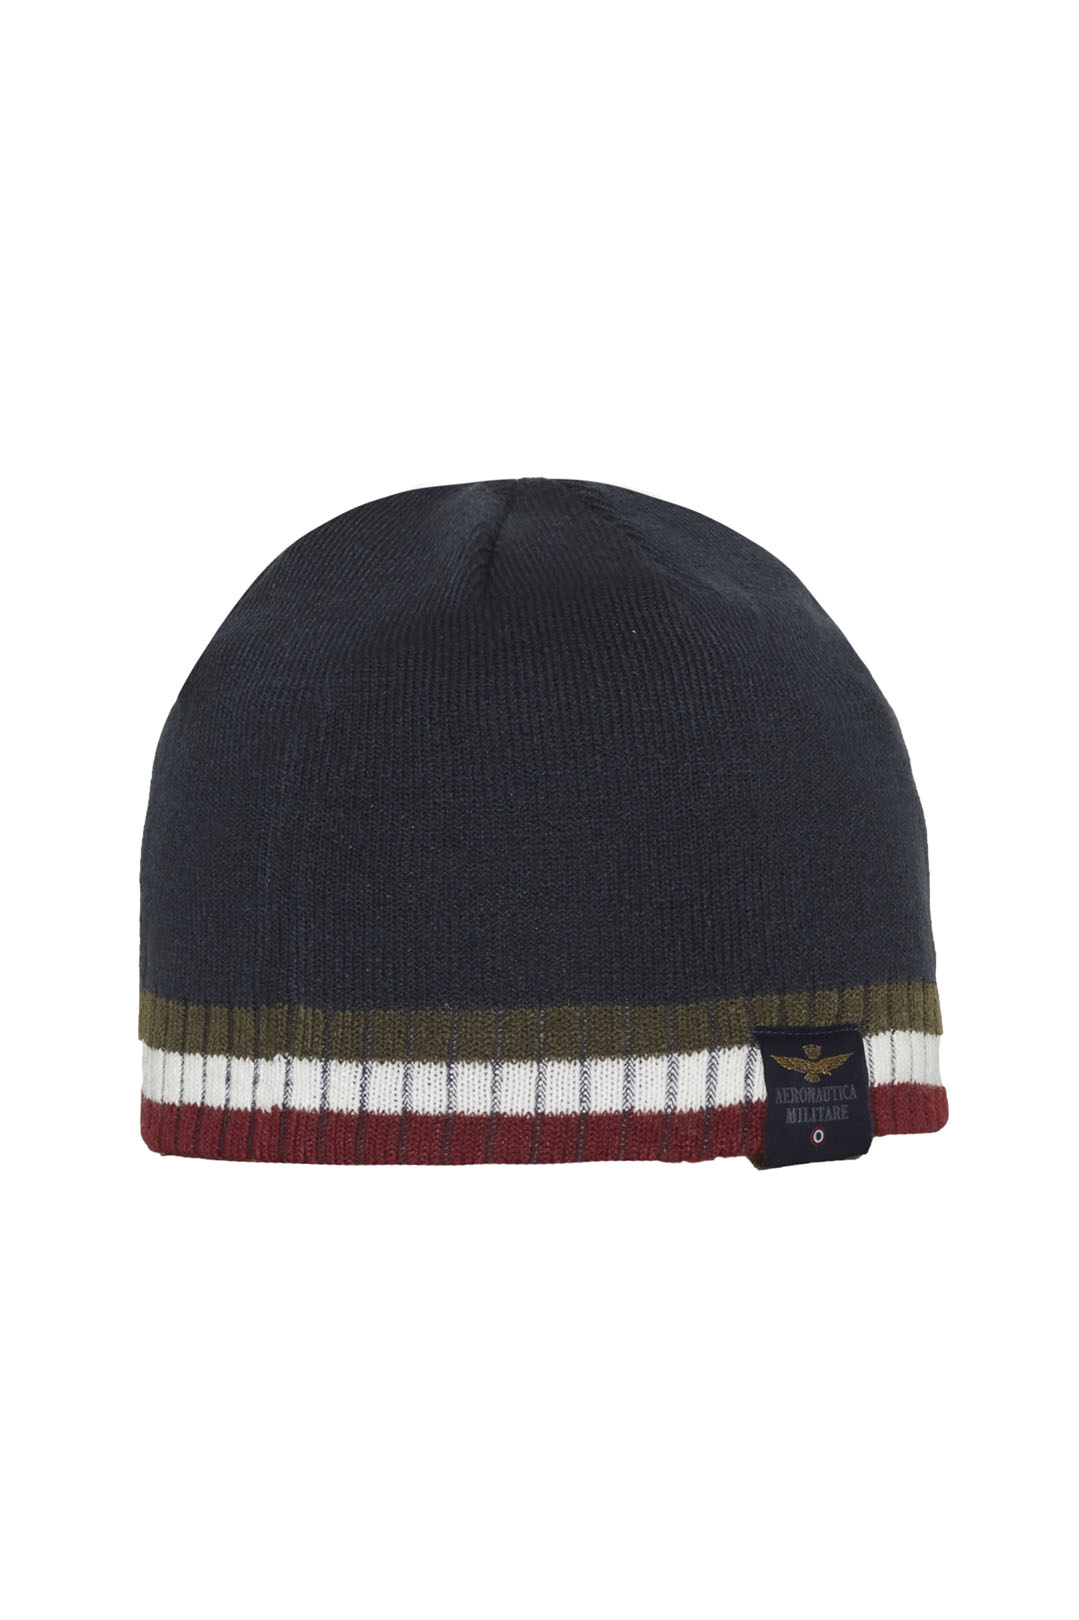 Tricolour embroidery knit cap            2